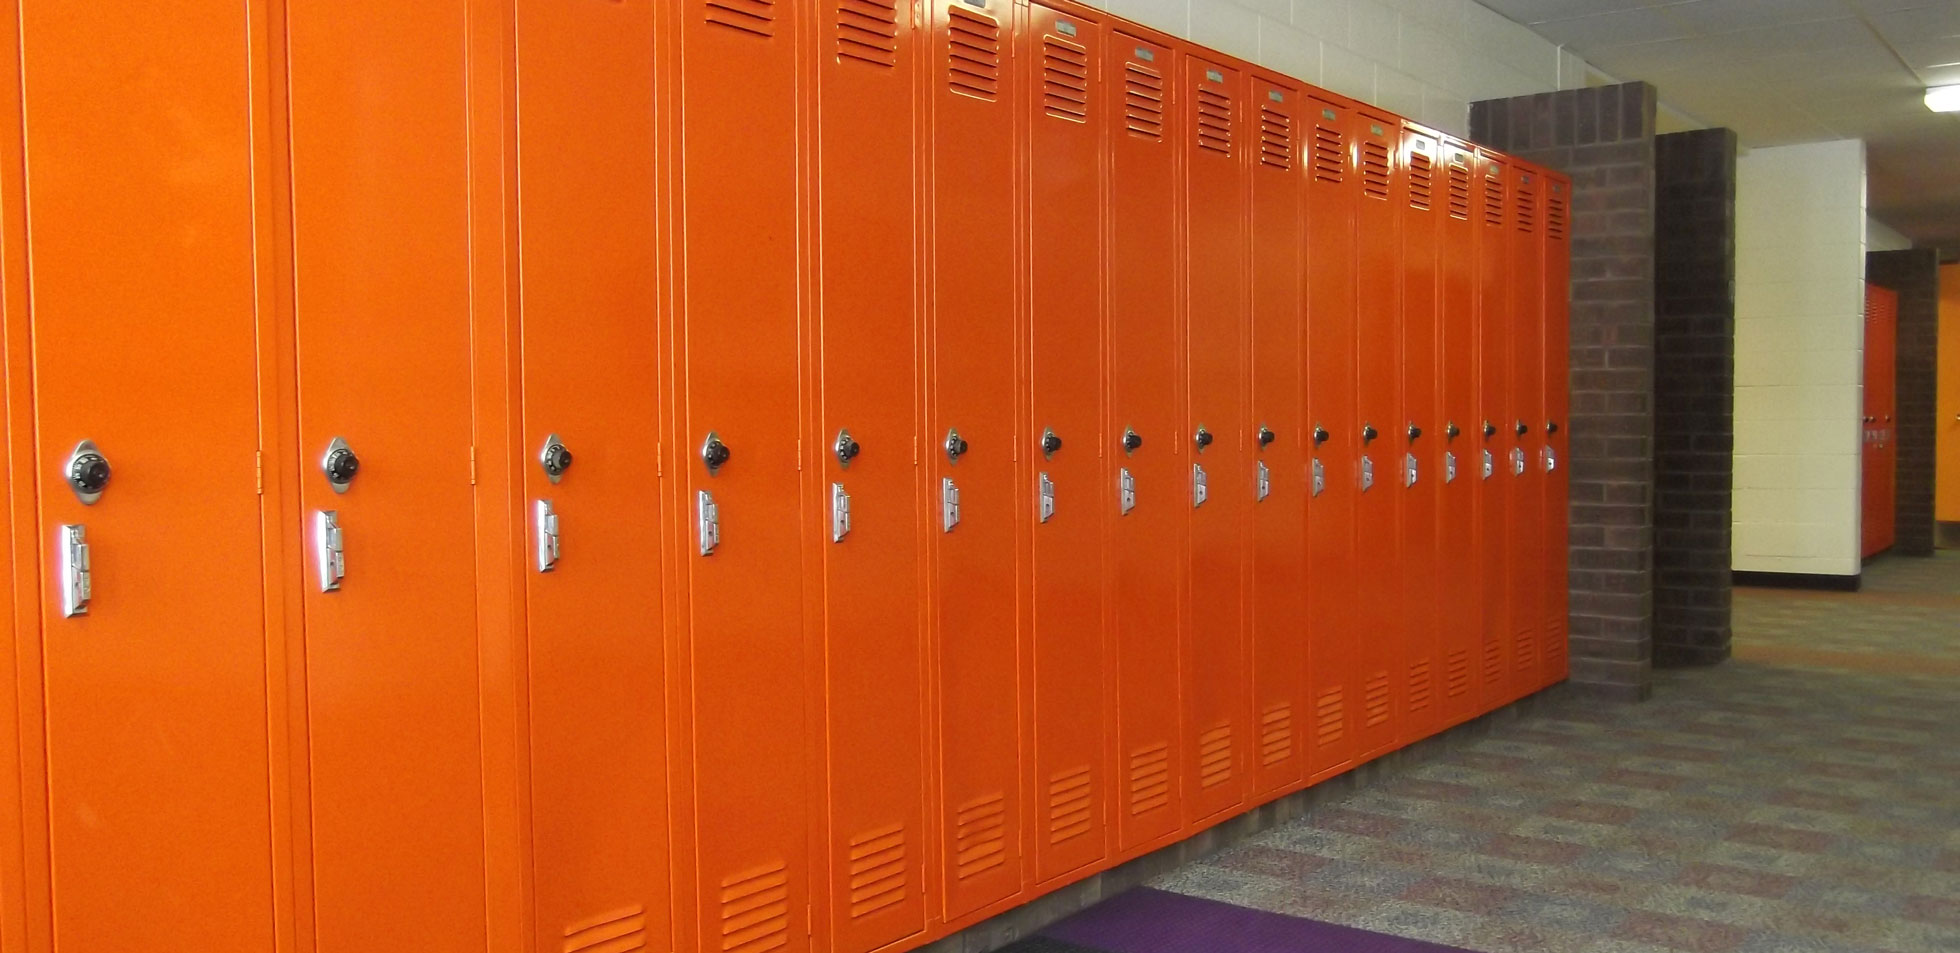 unicoat-electrostatic-spray-painting-services-grand-rapids-mi-school-lockers